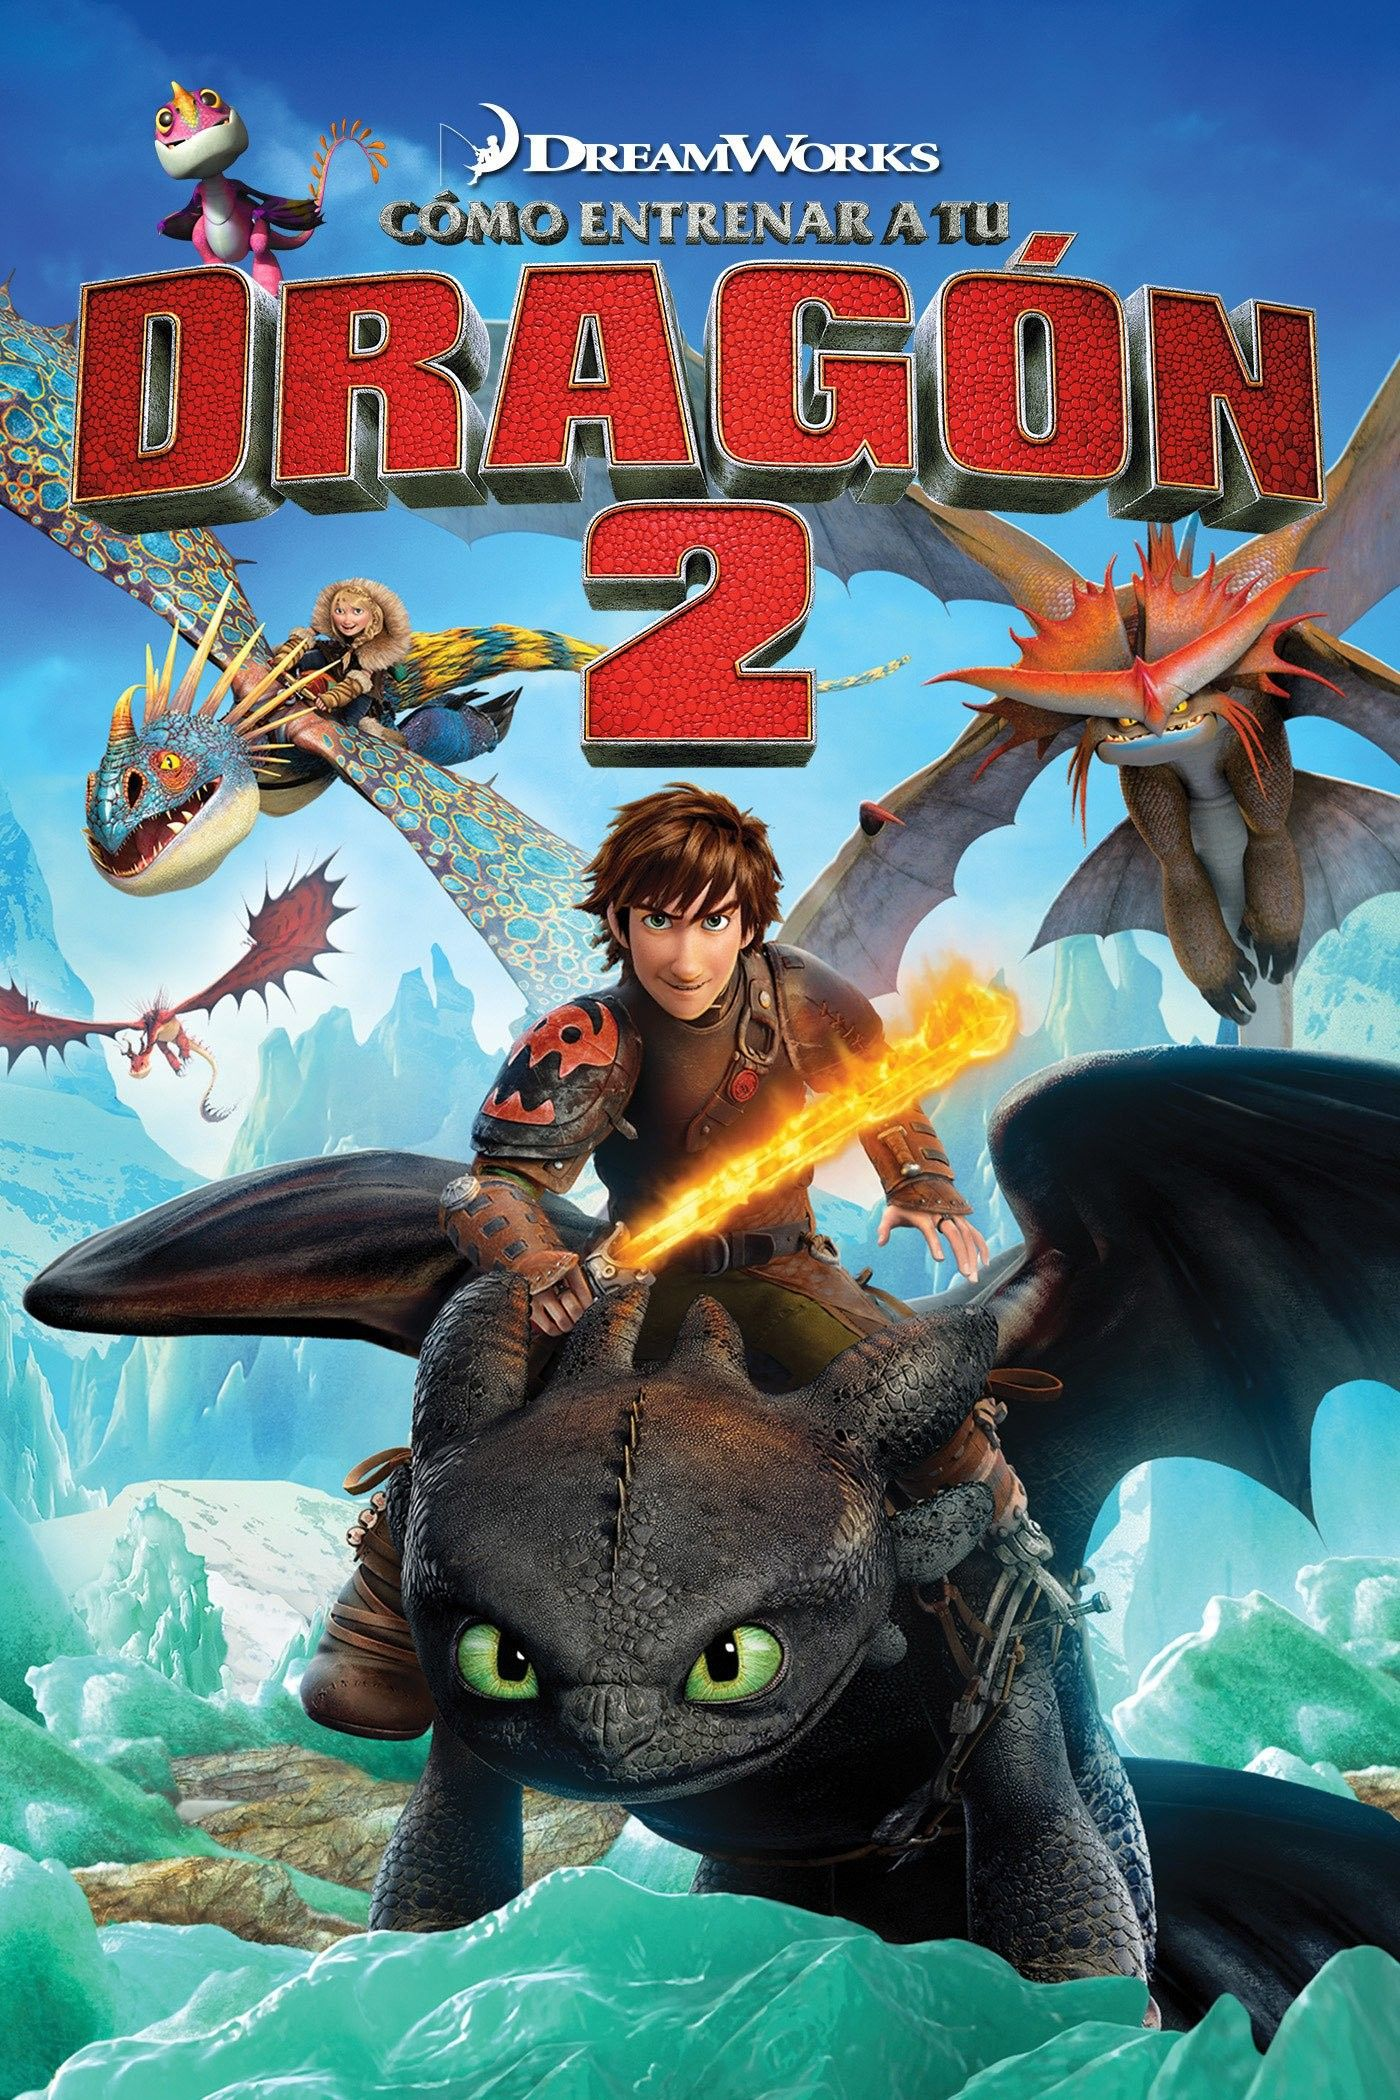 Ver Como Entrenar A Tu Dragon 2 Online Gratis 2014 Hd Pelicula Completa Espanol How Train Your Dragon How To Train Your Dragon Kid Movies